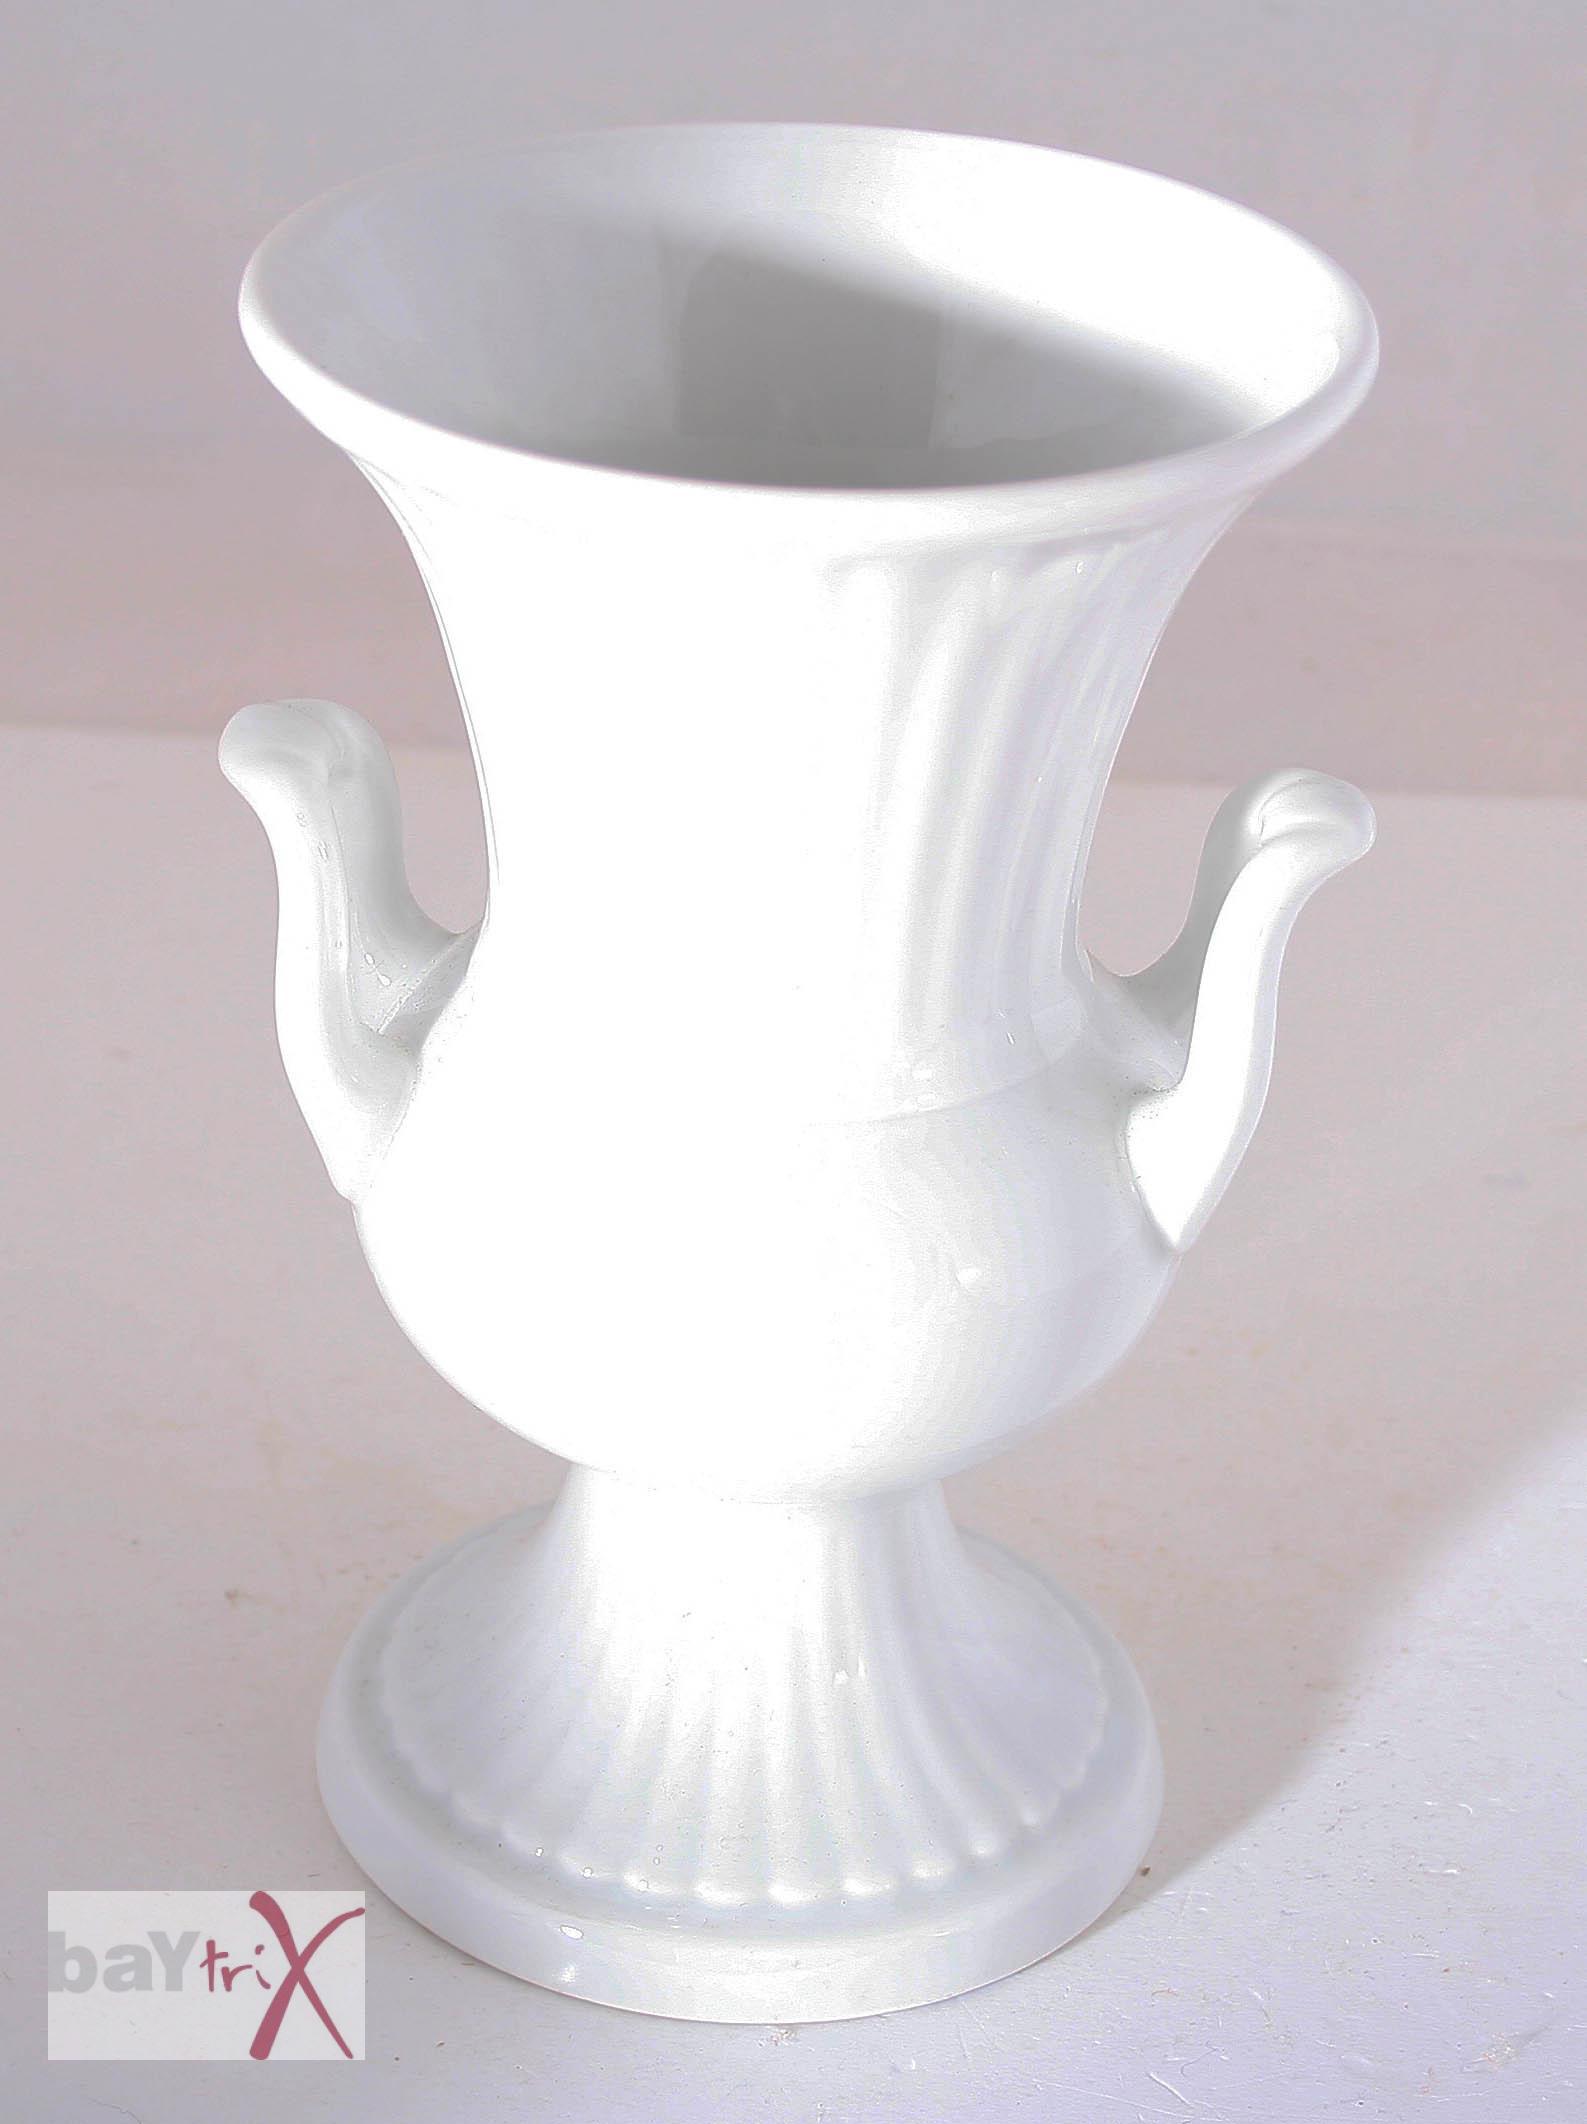 vase amphorenvase seltmann weiden e bavaria porzellan wei amphore glasiert ebay. Black Bedroom Furniture Sets. Home Design Ideas